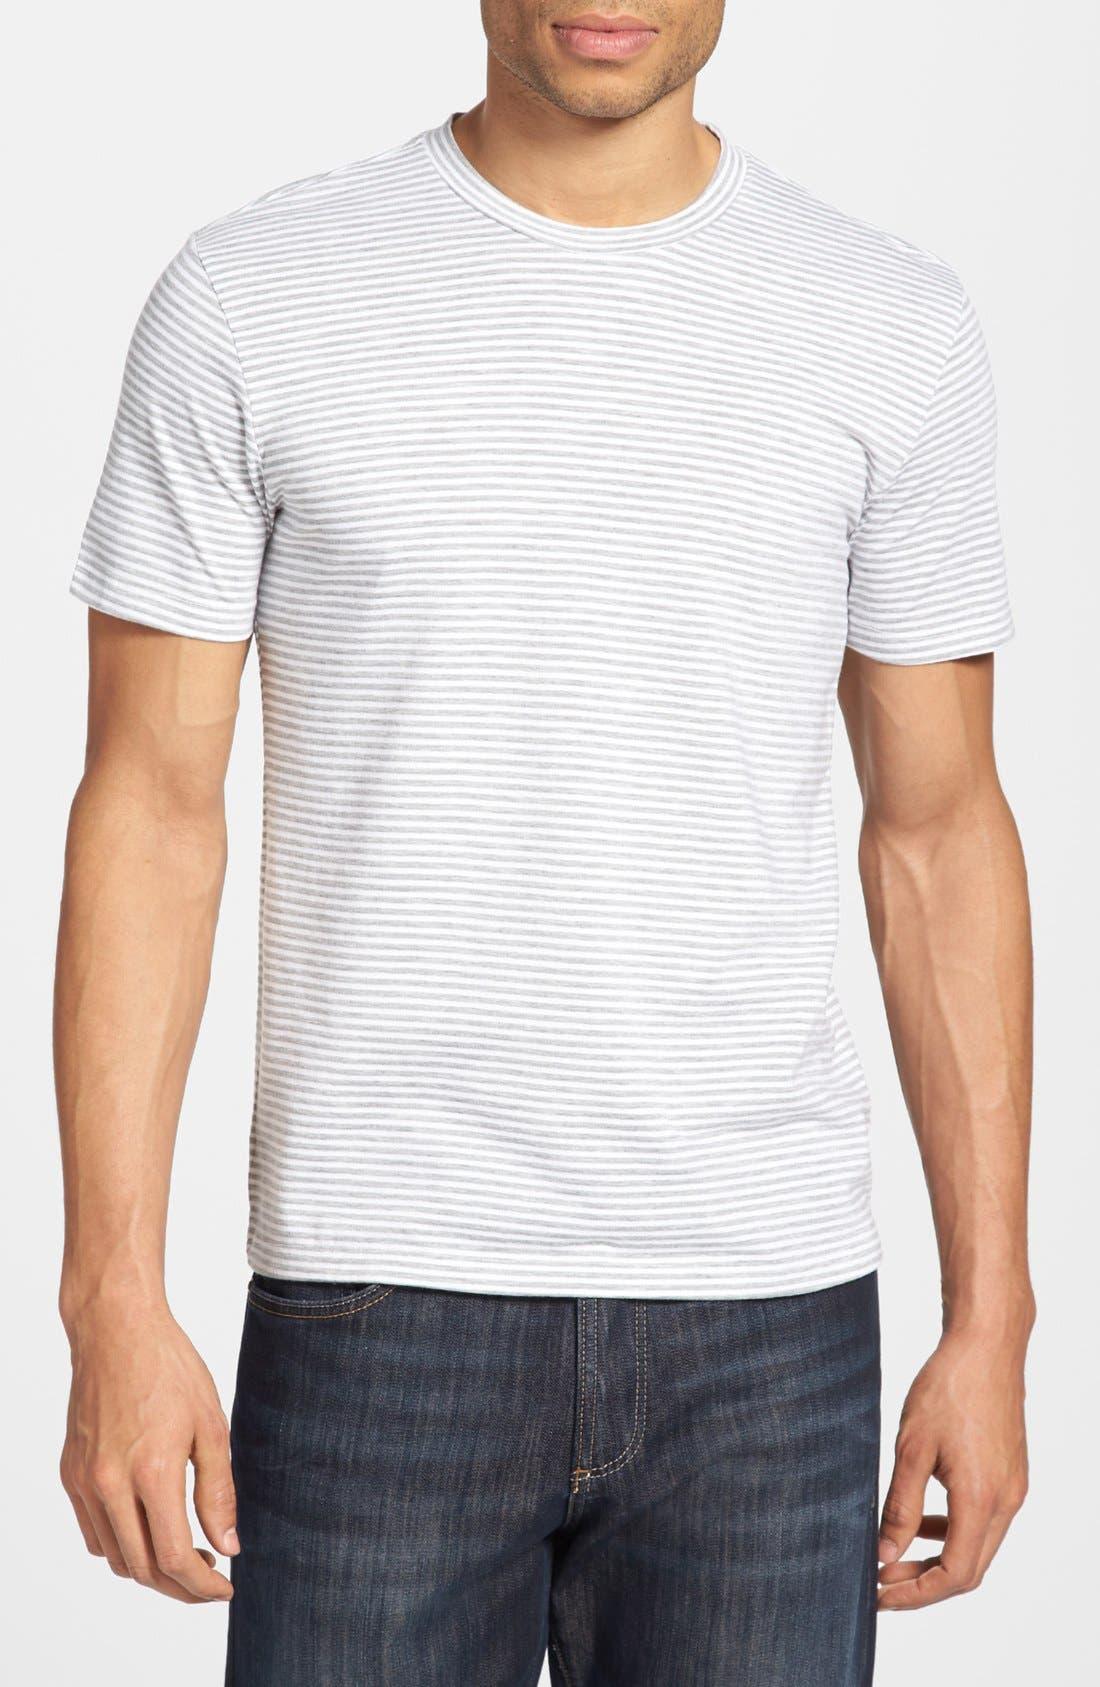 Main Image - The Rail Feeder Stripe Crewneck T-Shirt